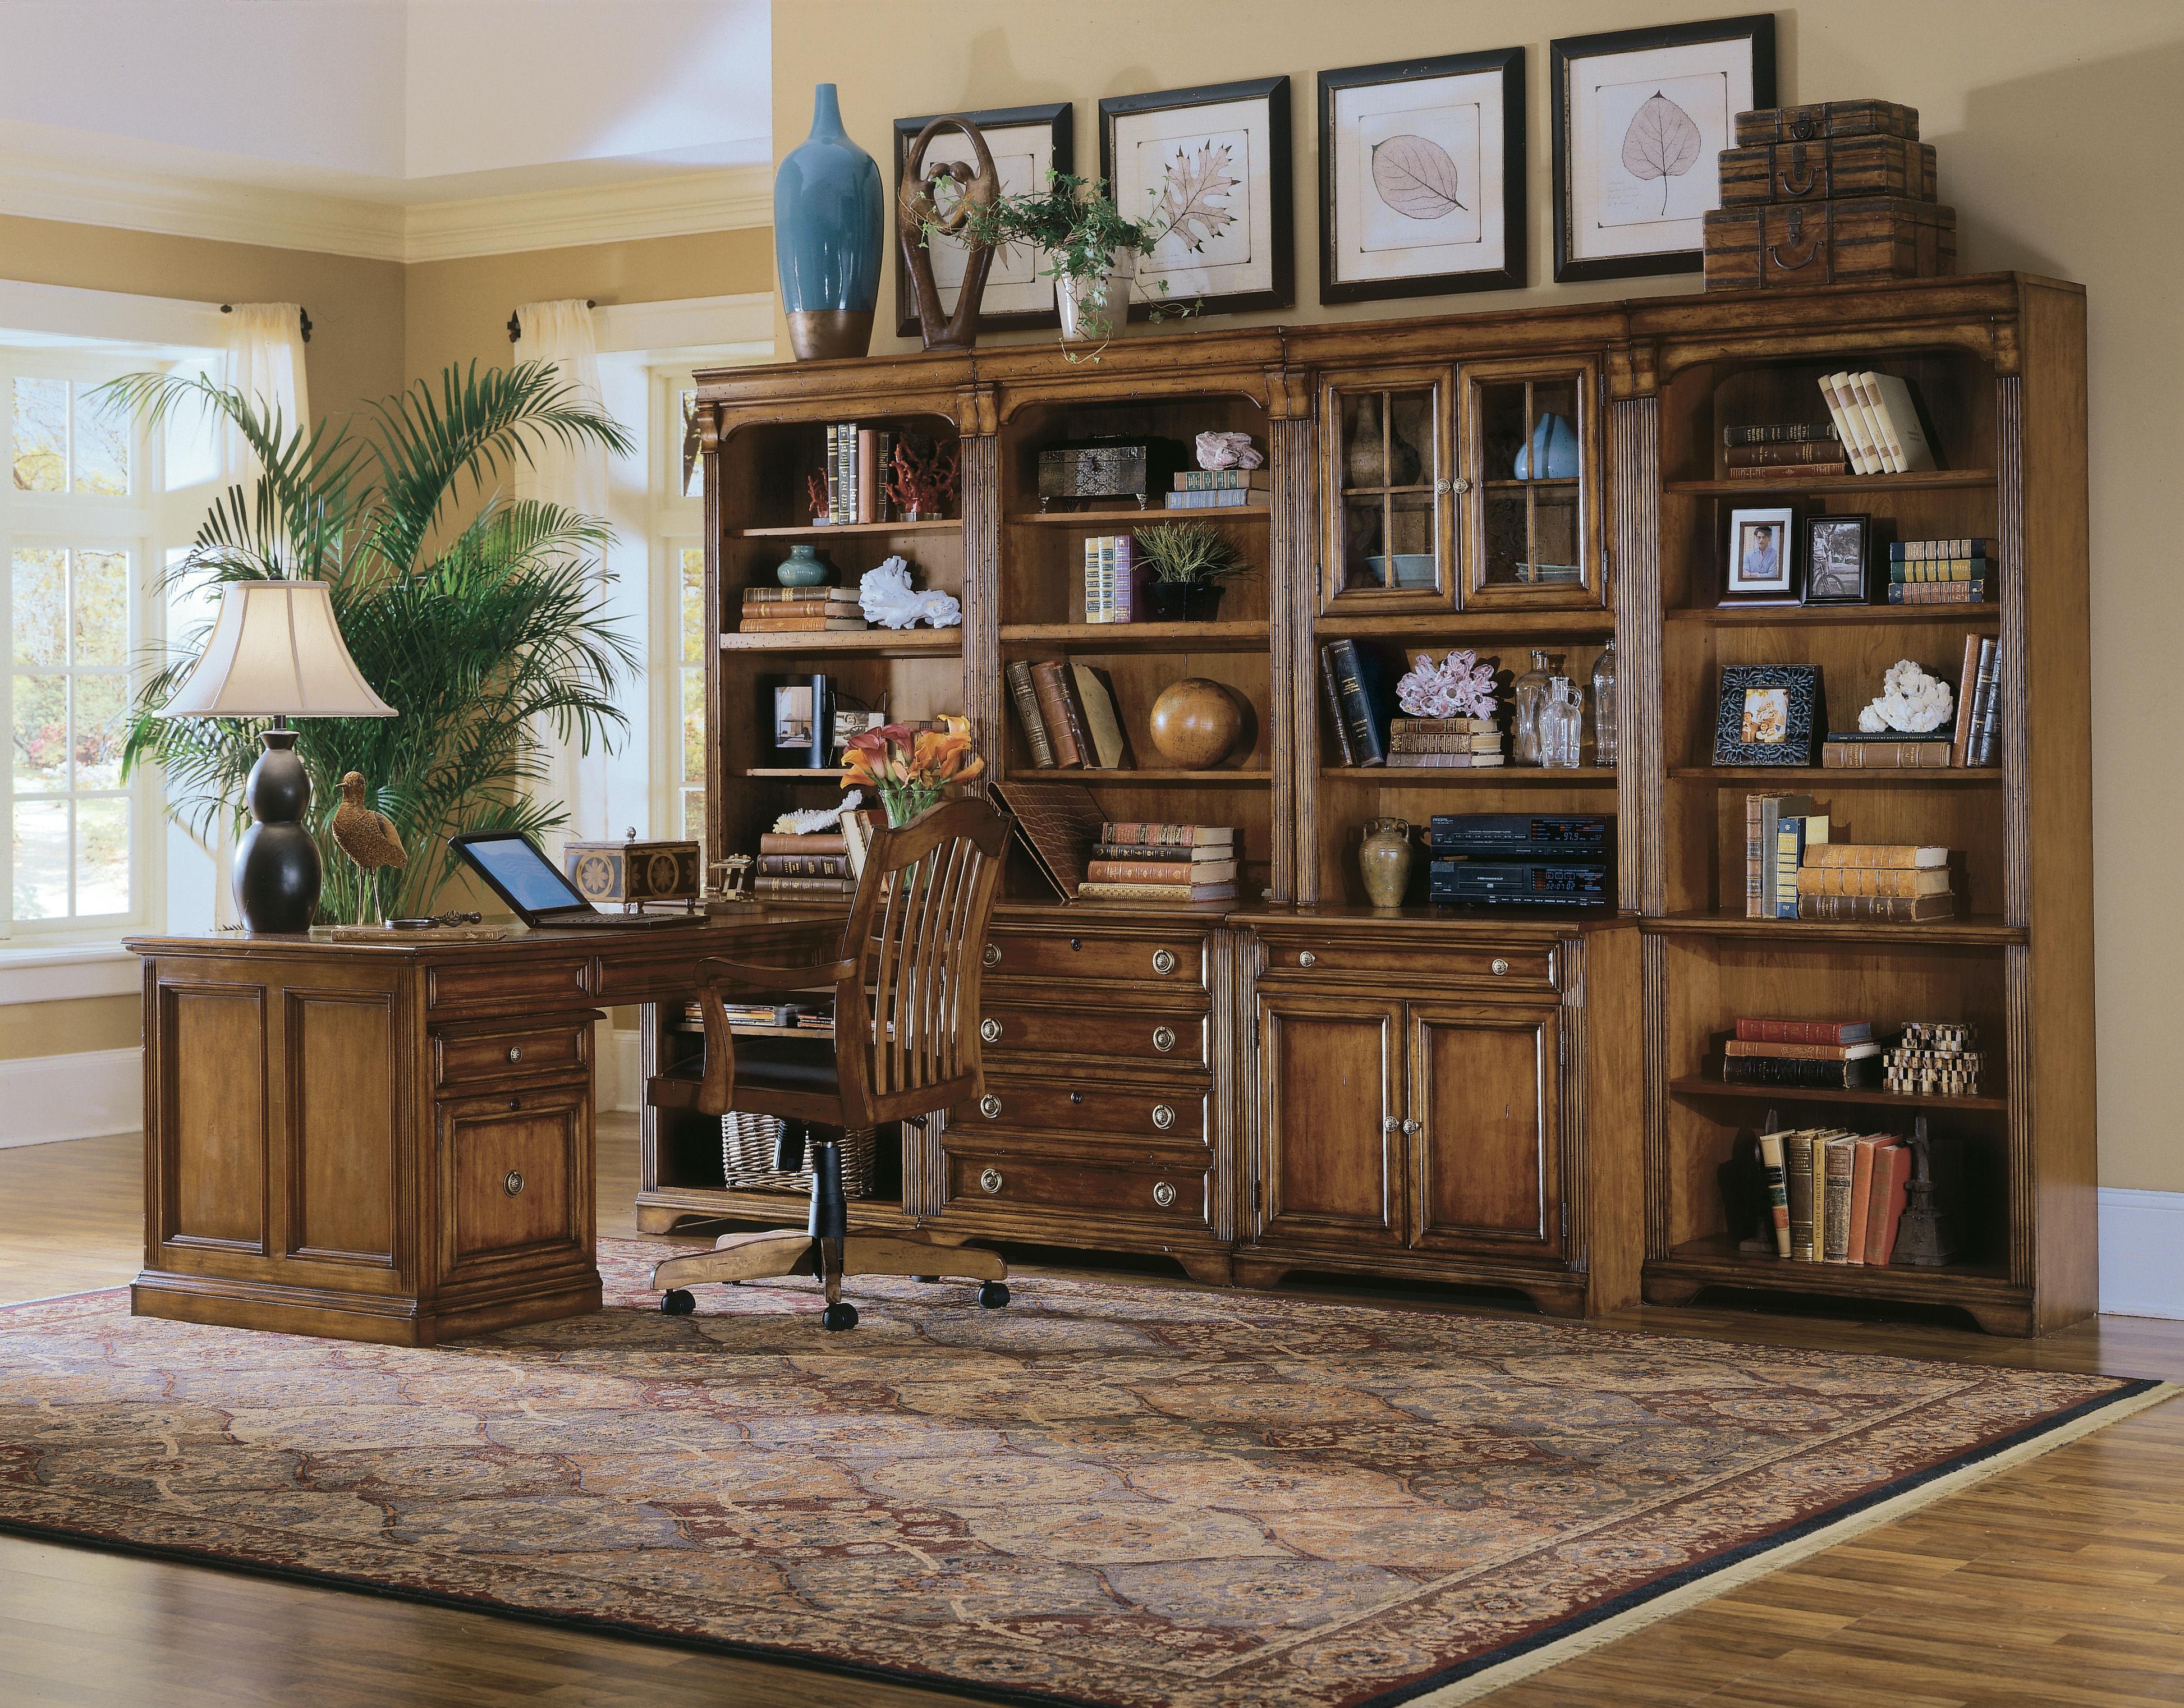 Peninsula desk office furniture - Hooker Furniture Brookhaven Peninsula Desk 281 10 411